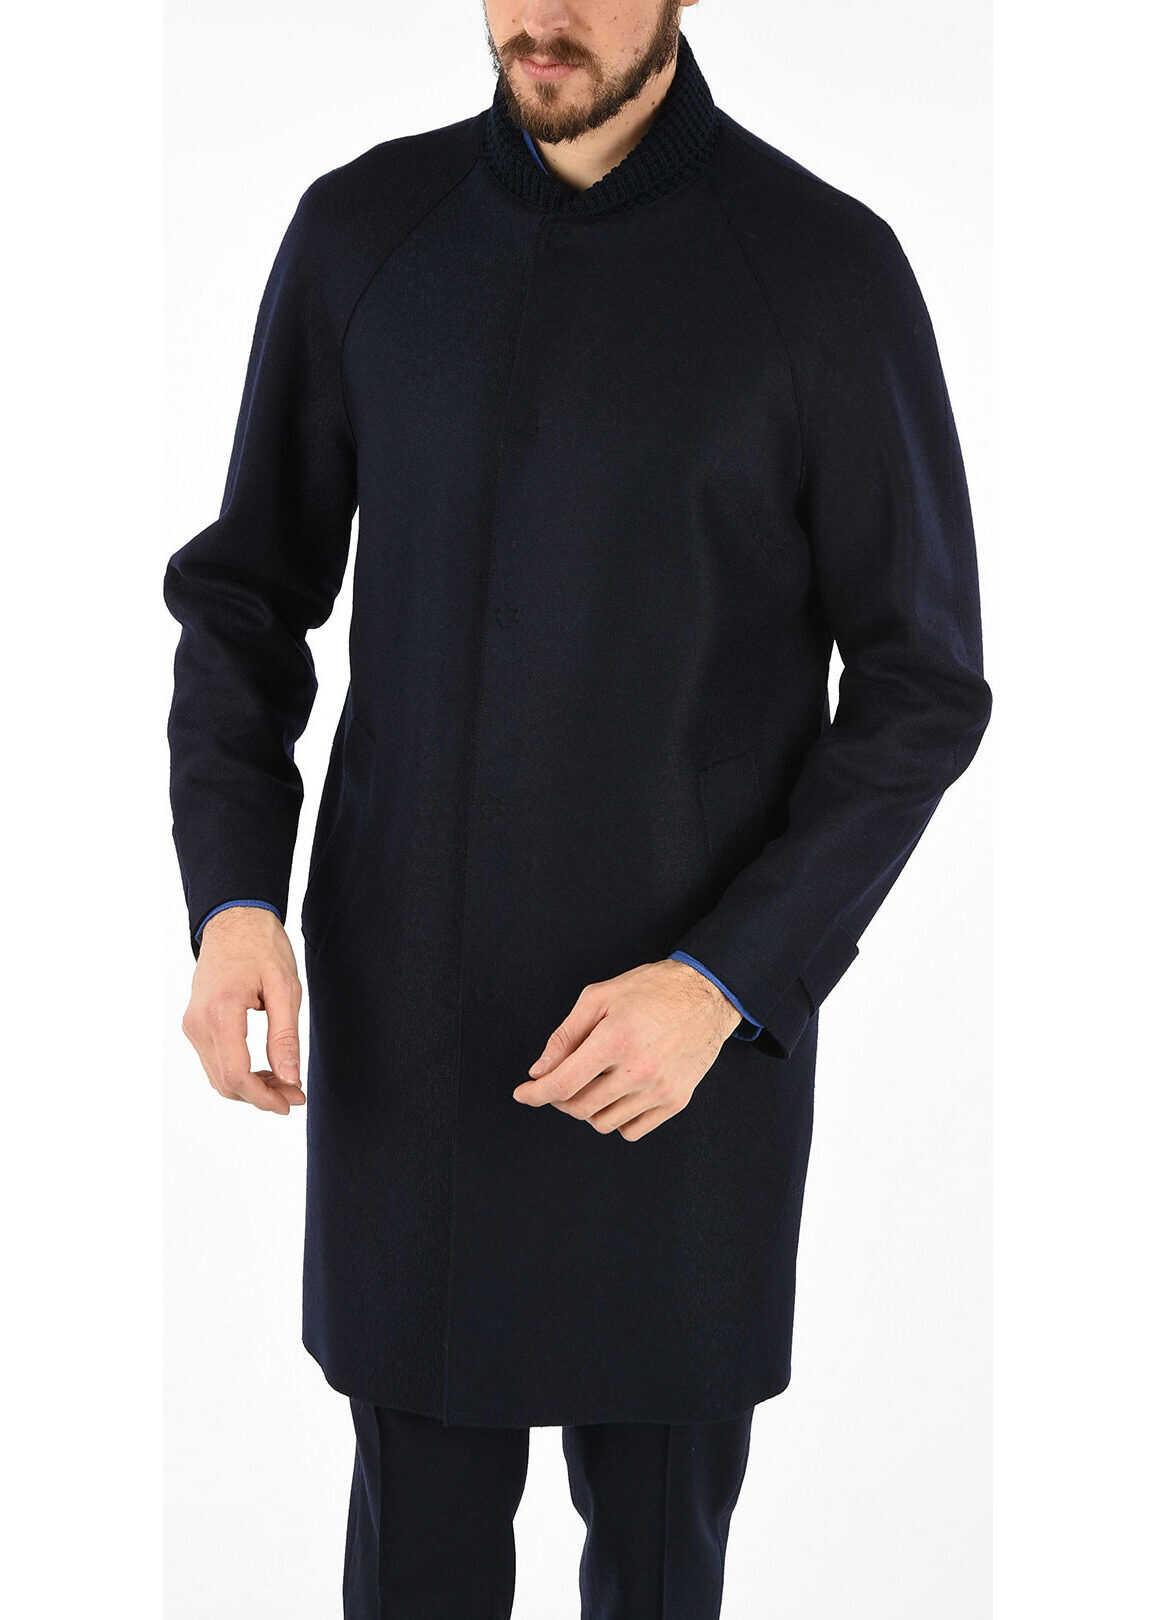 Armani EMPORIO Wool Coat BLUE